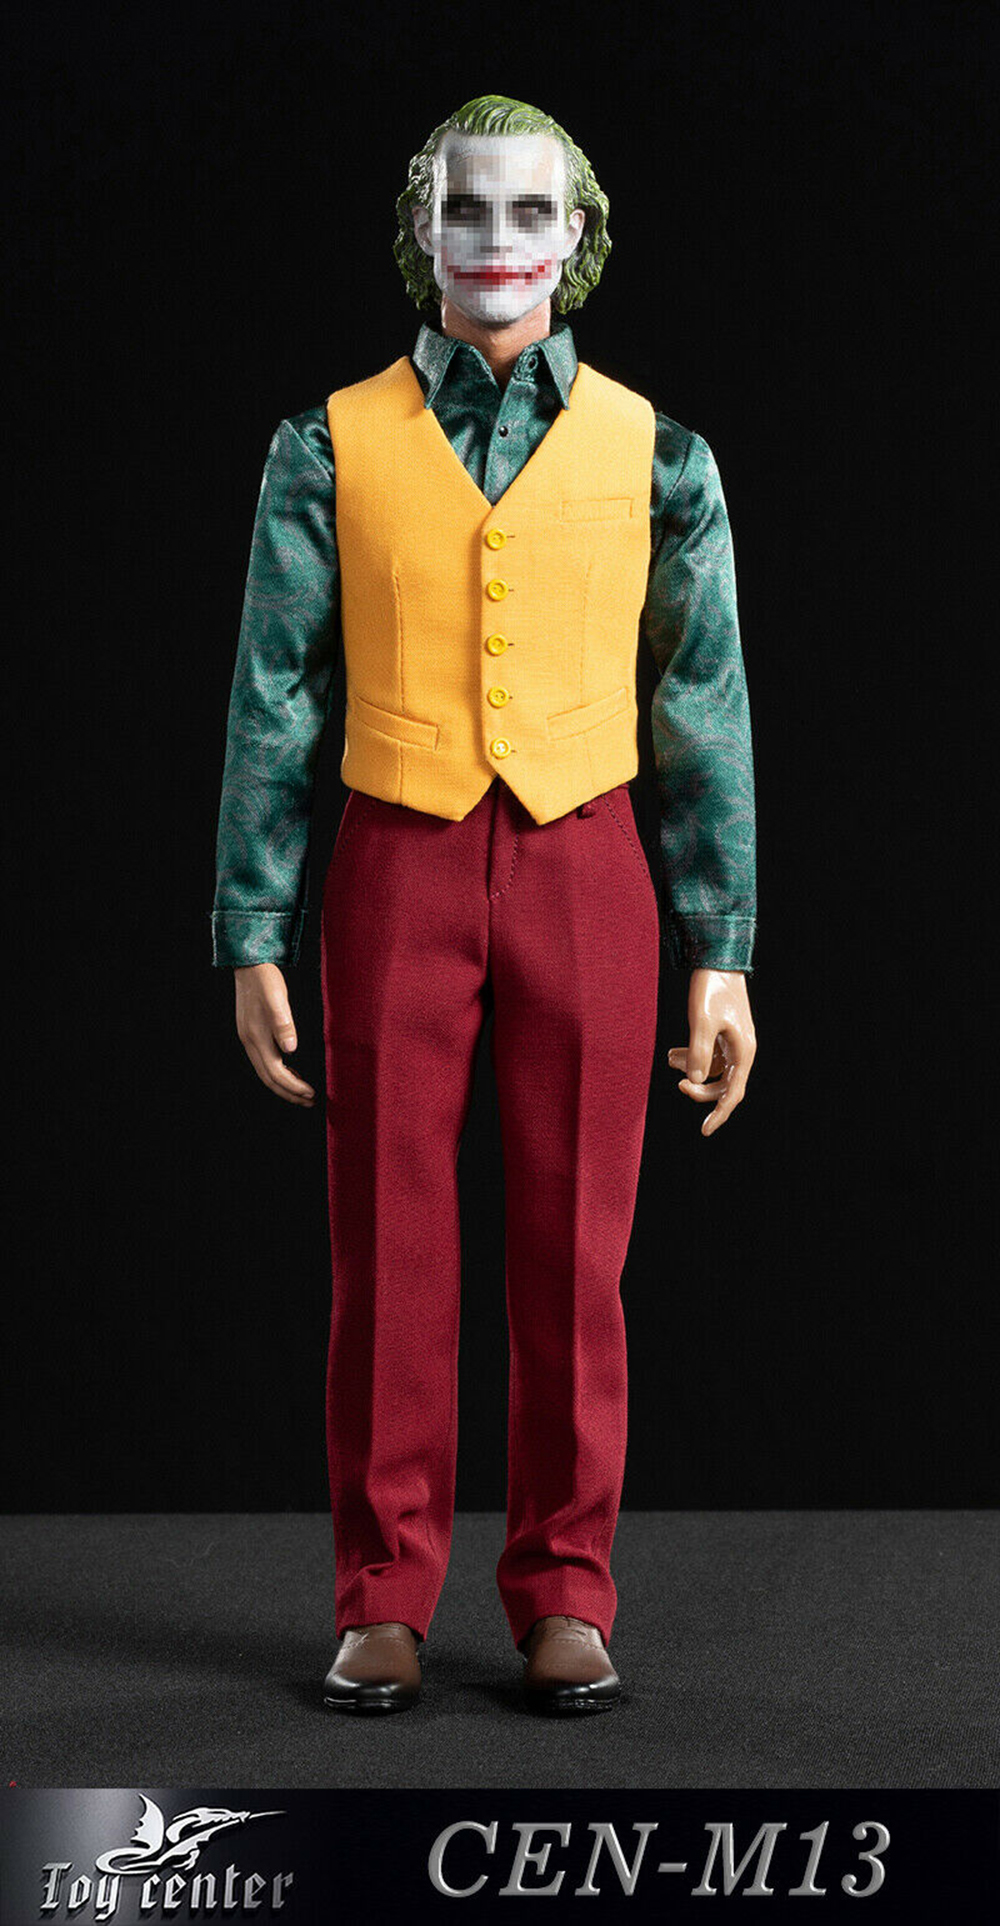 Toy Center 1//6 Casual Male Dress Suit Clothes F 12/'/' Hottoys Figure CEN-M15